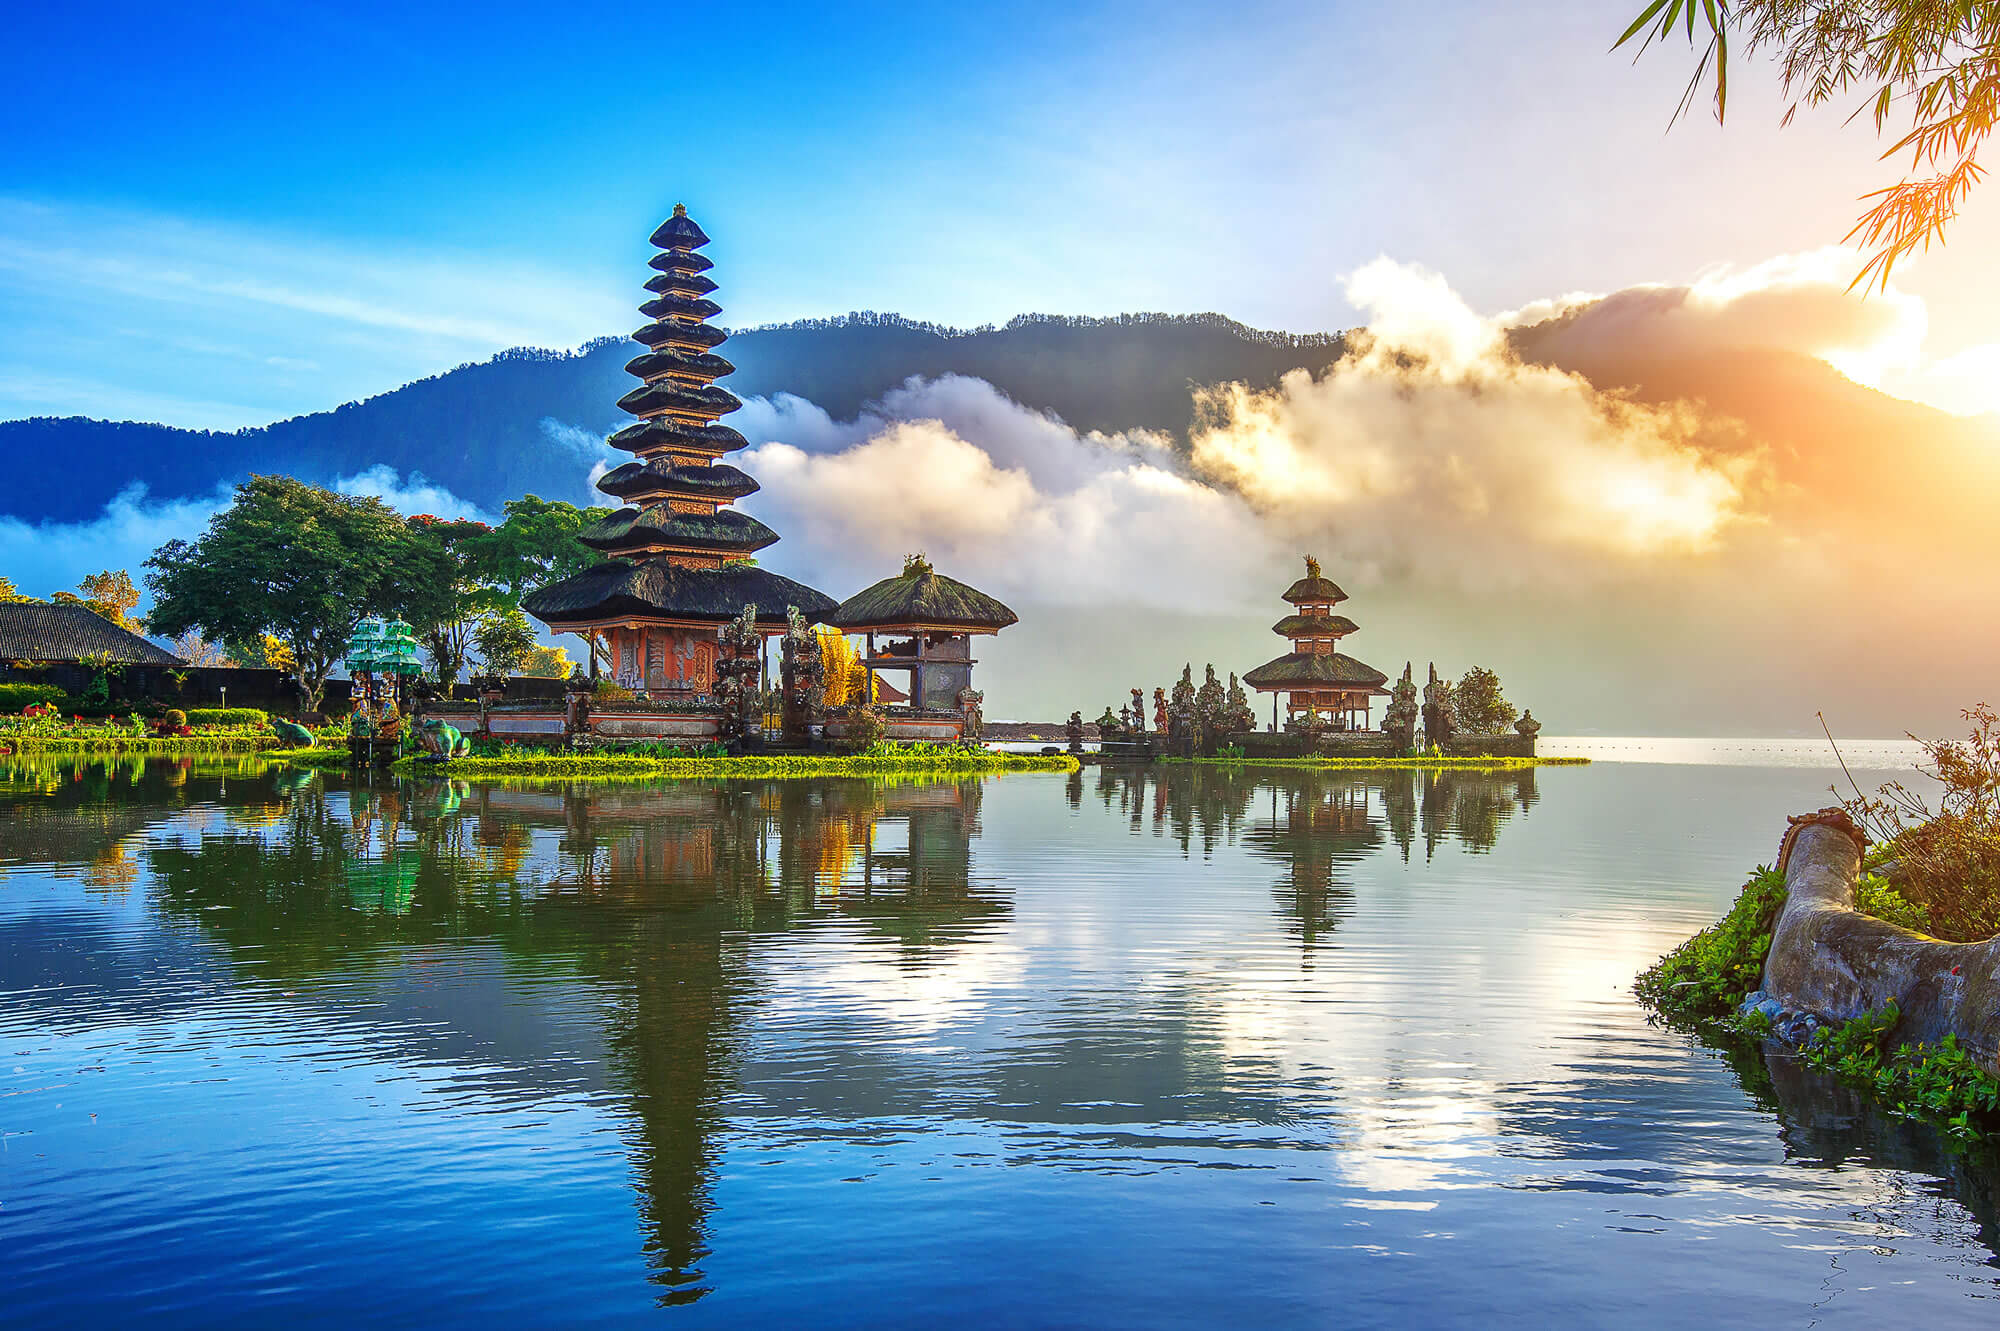 Pura ulun danu bratan temple, Indonesia